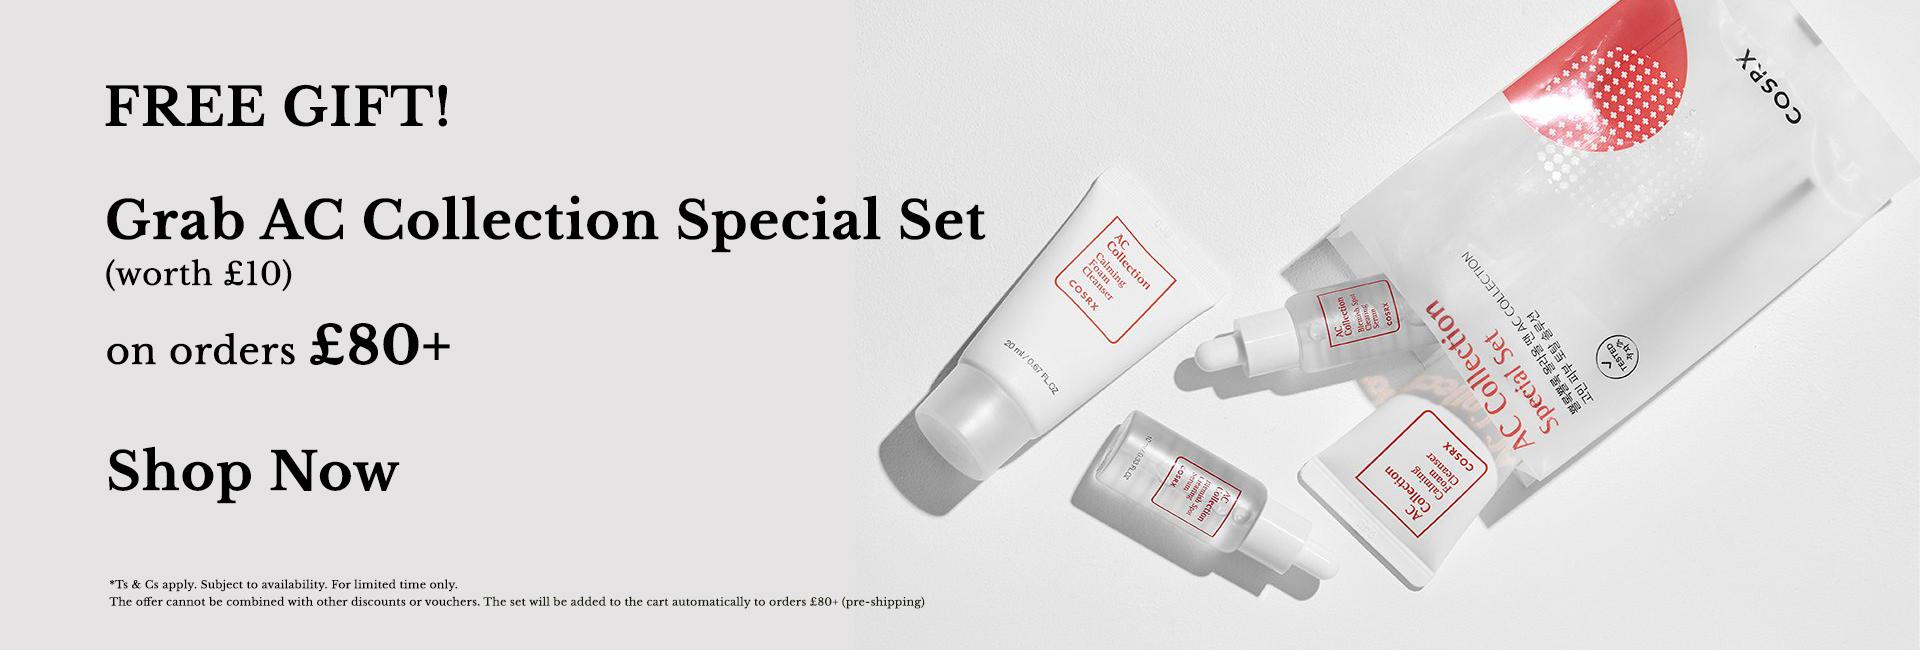 Free COSRX AC Collection Set